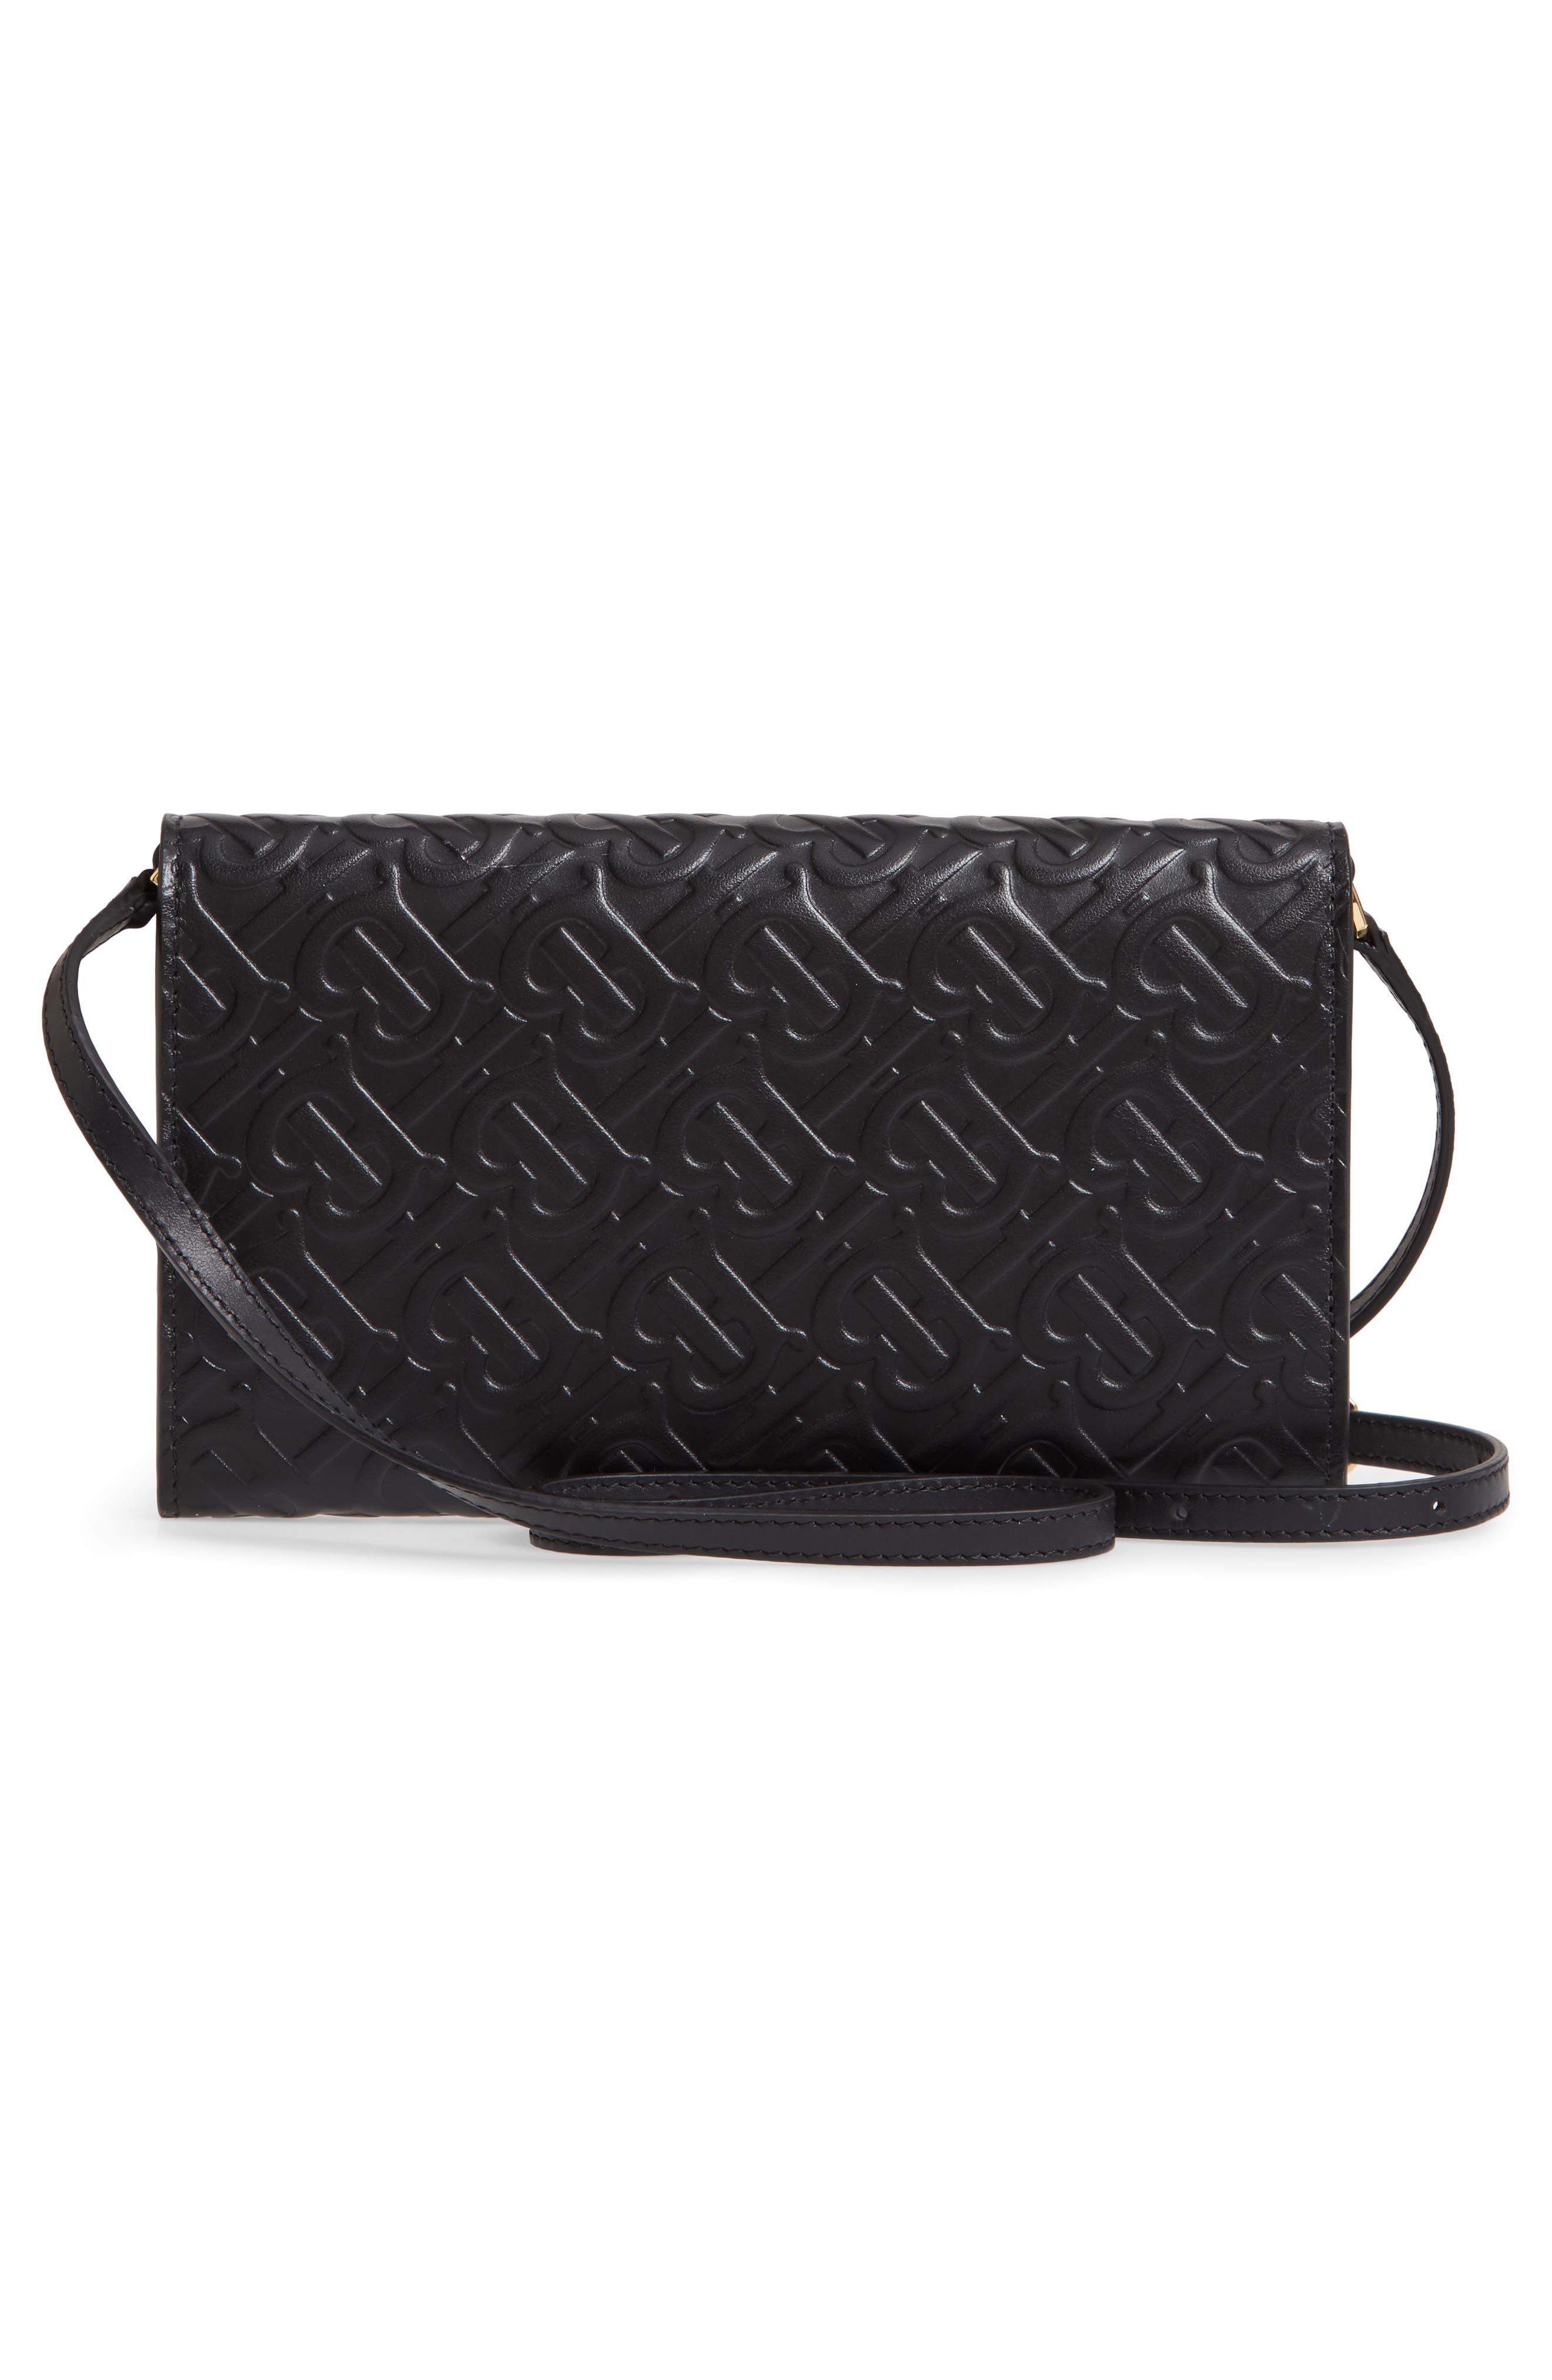 BURBERRY, Monogram Embossed Leather Crossbody Wallet, Alternate thumbnail 3, color, BLACK